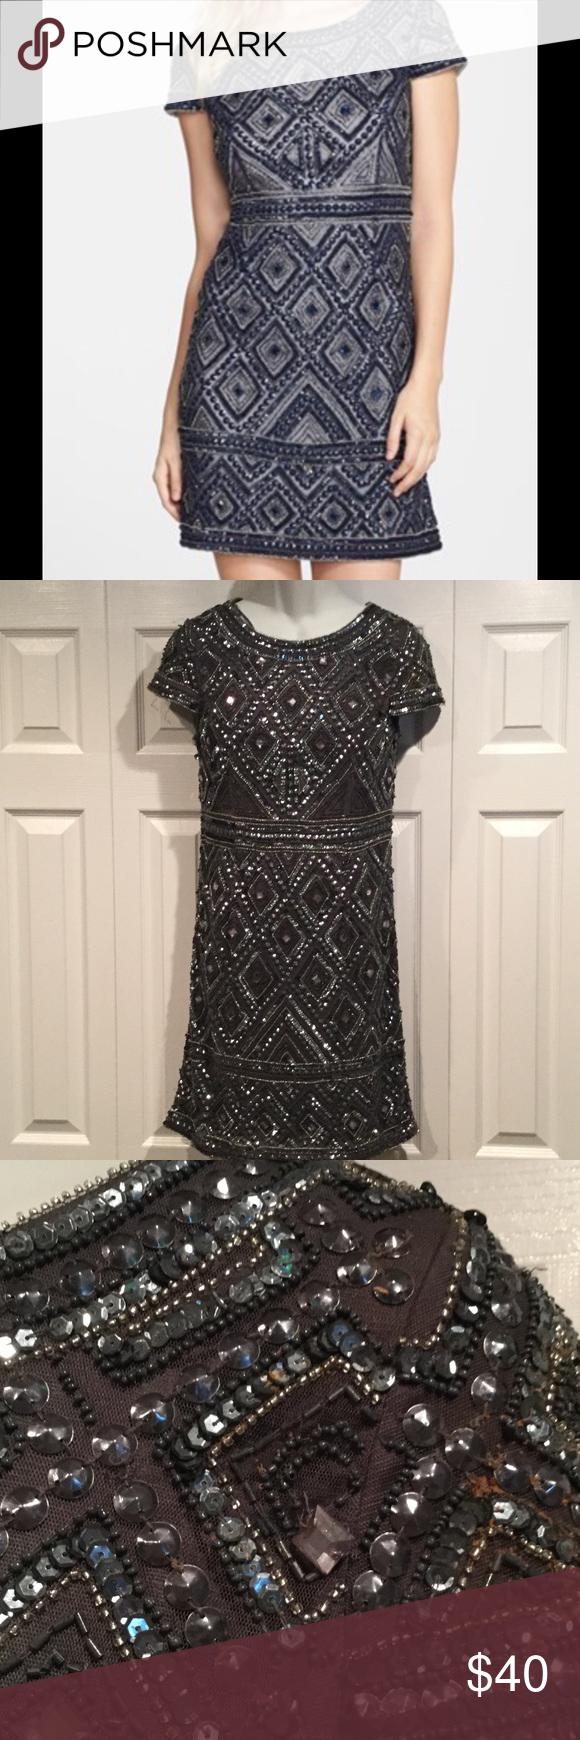 Adrianna papell sequin bodycon dress quartz valley